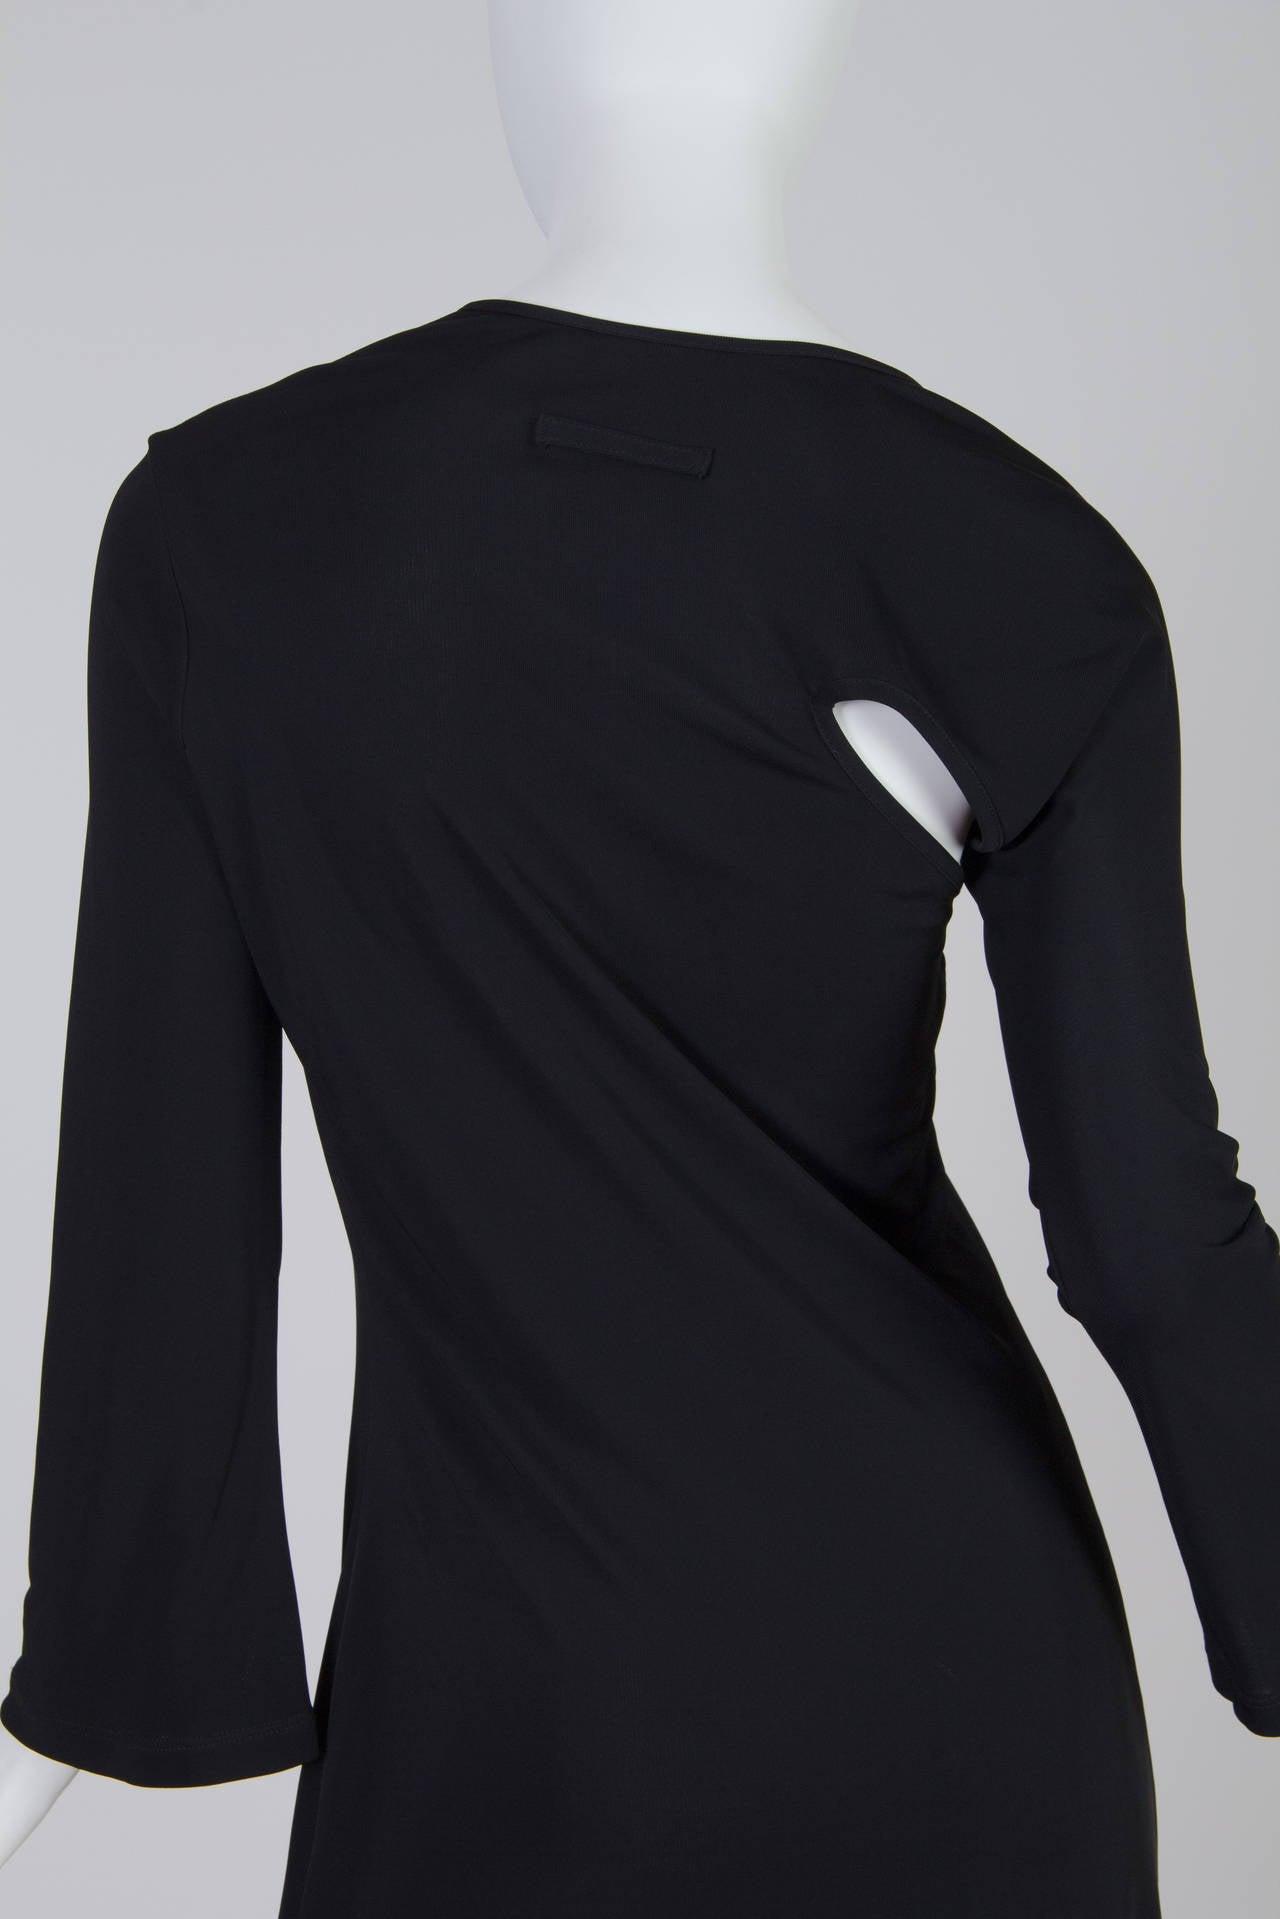 Jean Paul Gaultier Wraparound Sleeve Dress For Sale 4